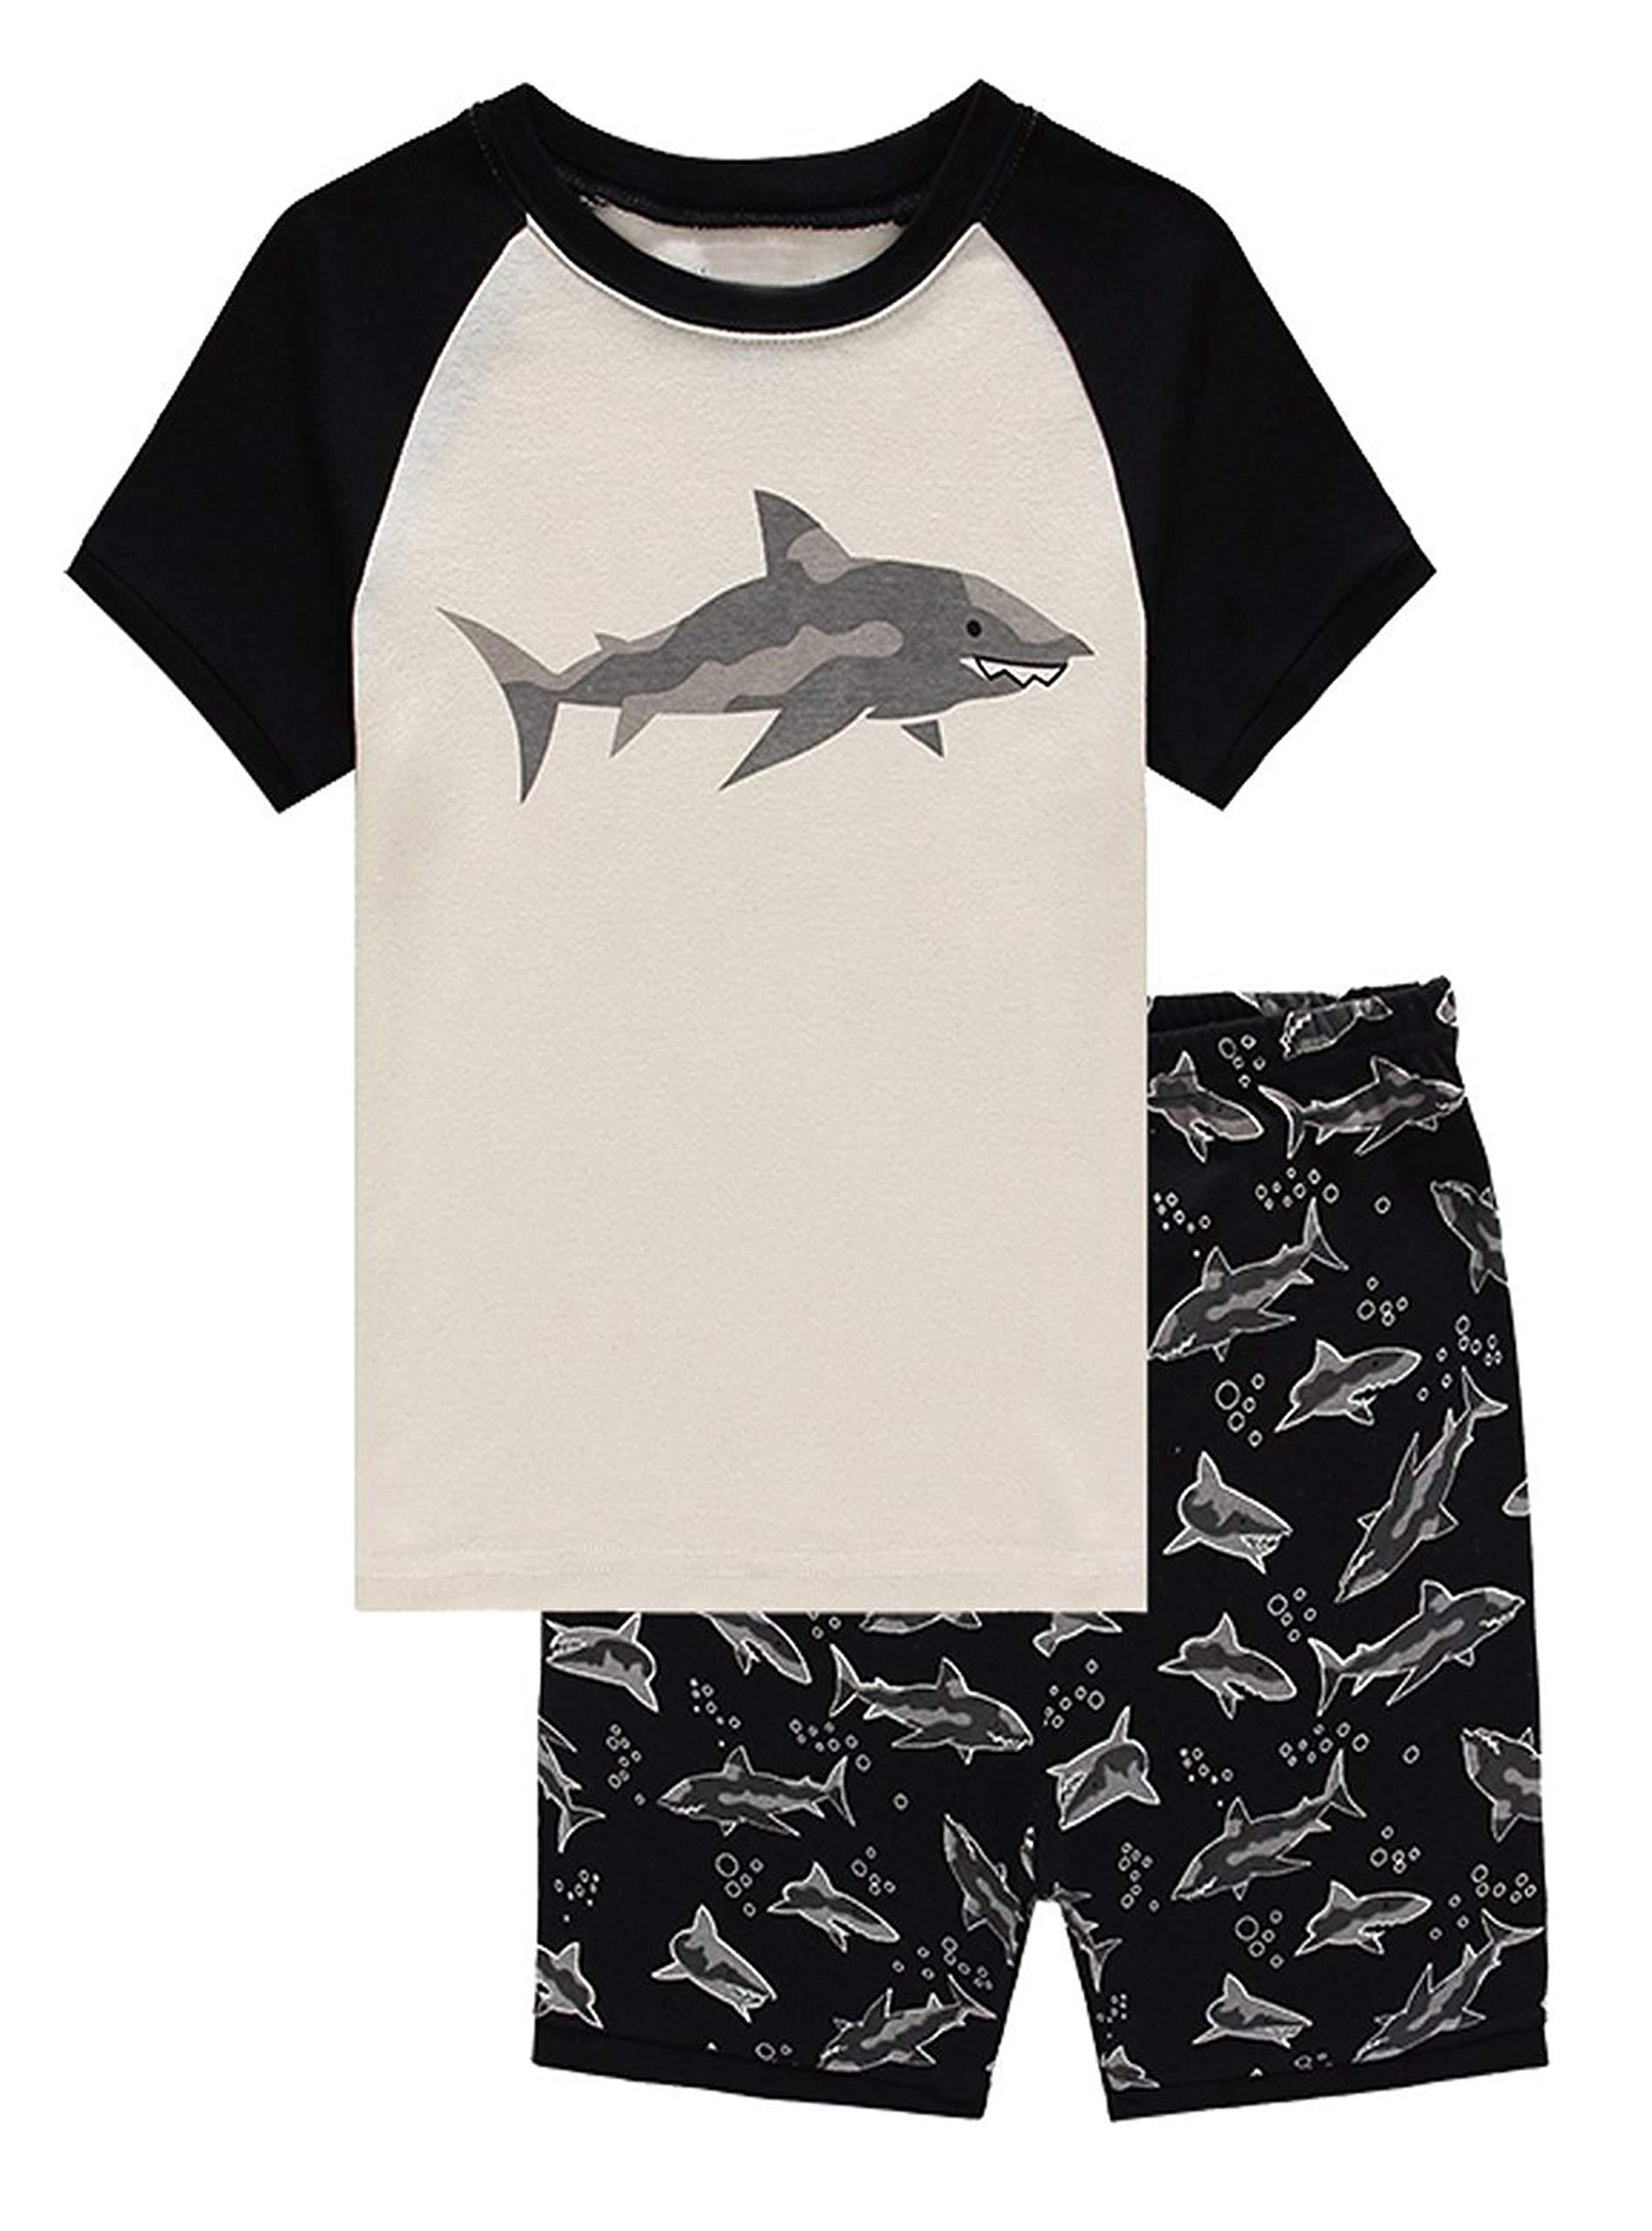 Family Feeling Shark Big Boys Shorts Set Pajamas 100% Cotton Sleepwear Toddler Kids Size 8 Black/White